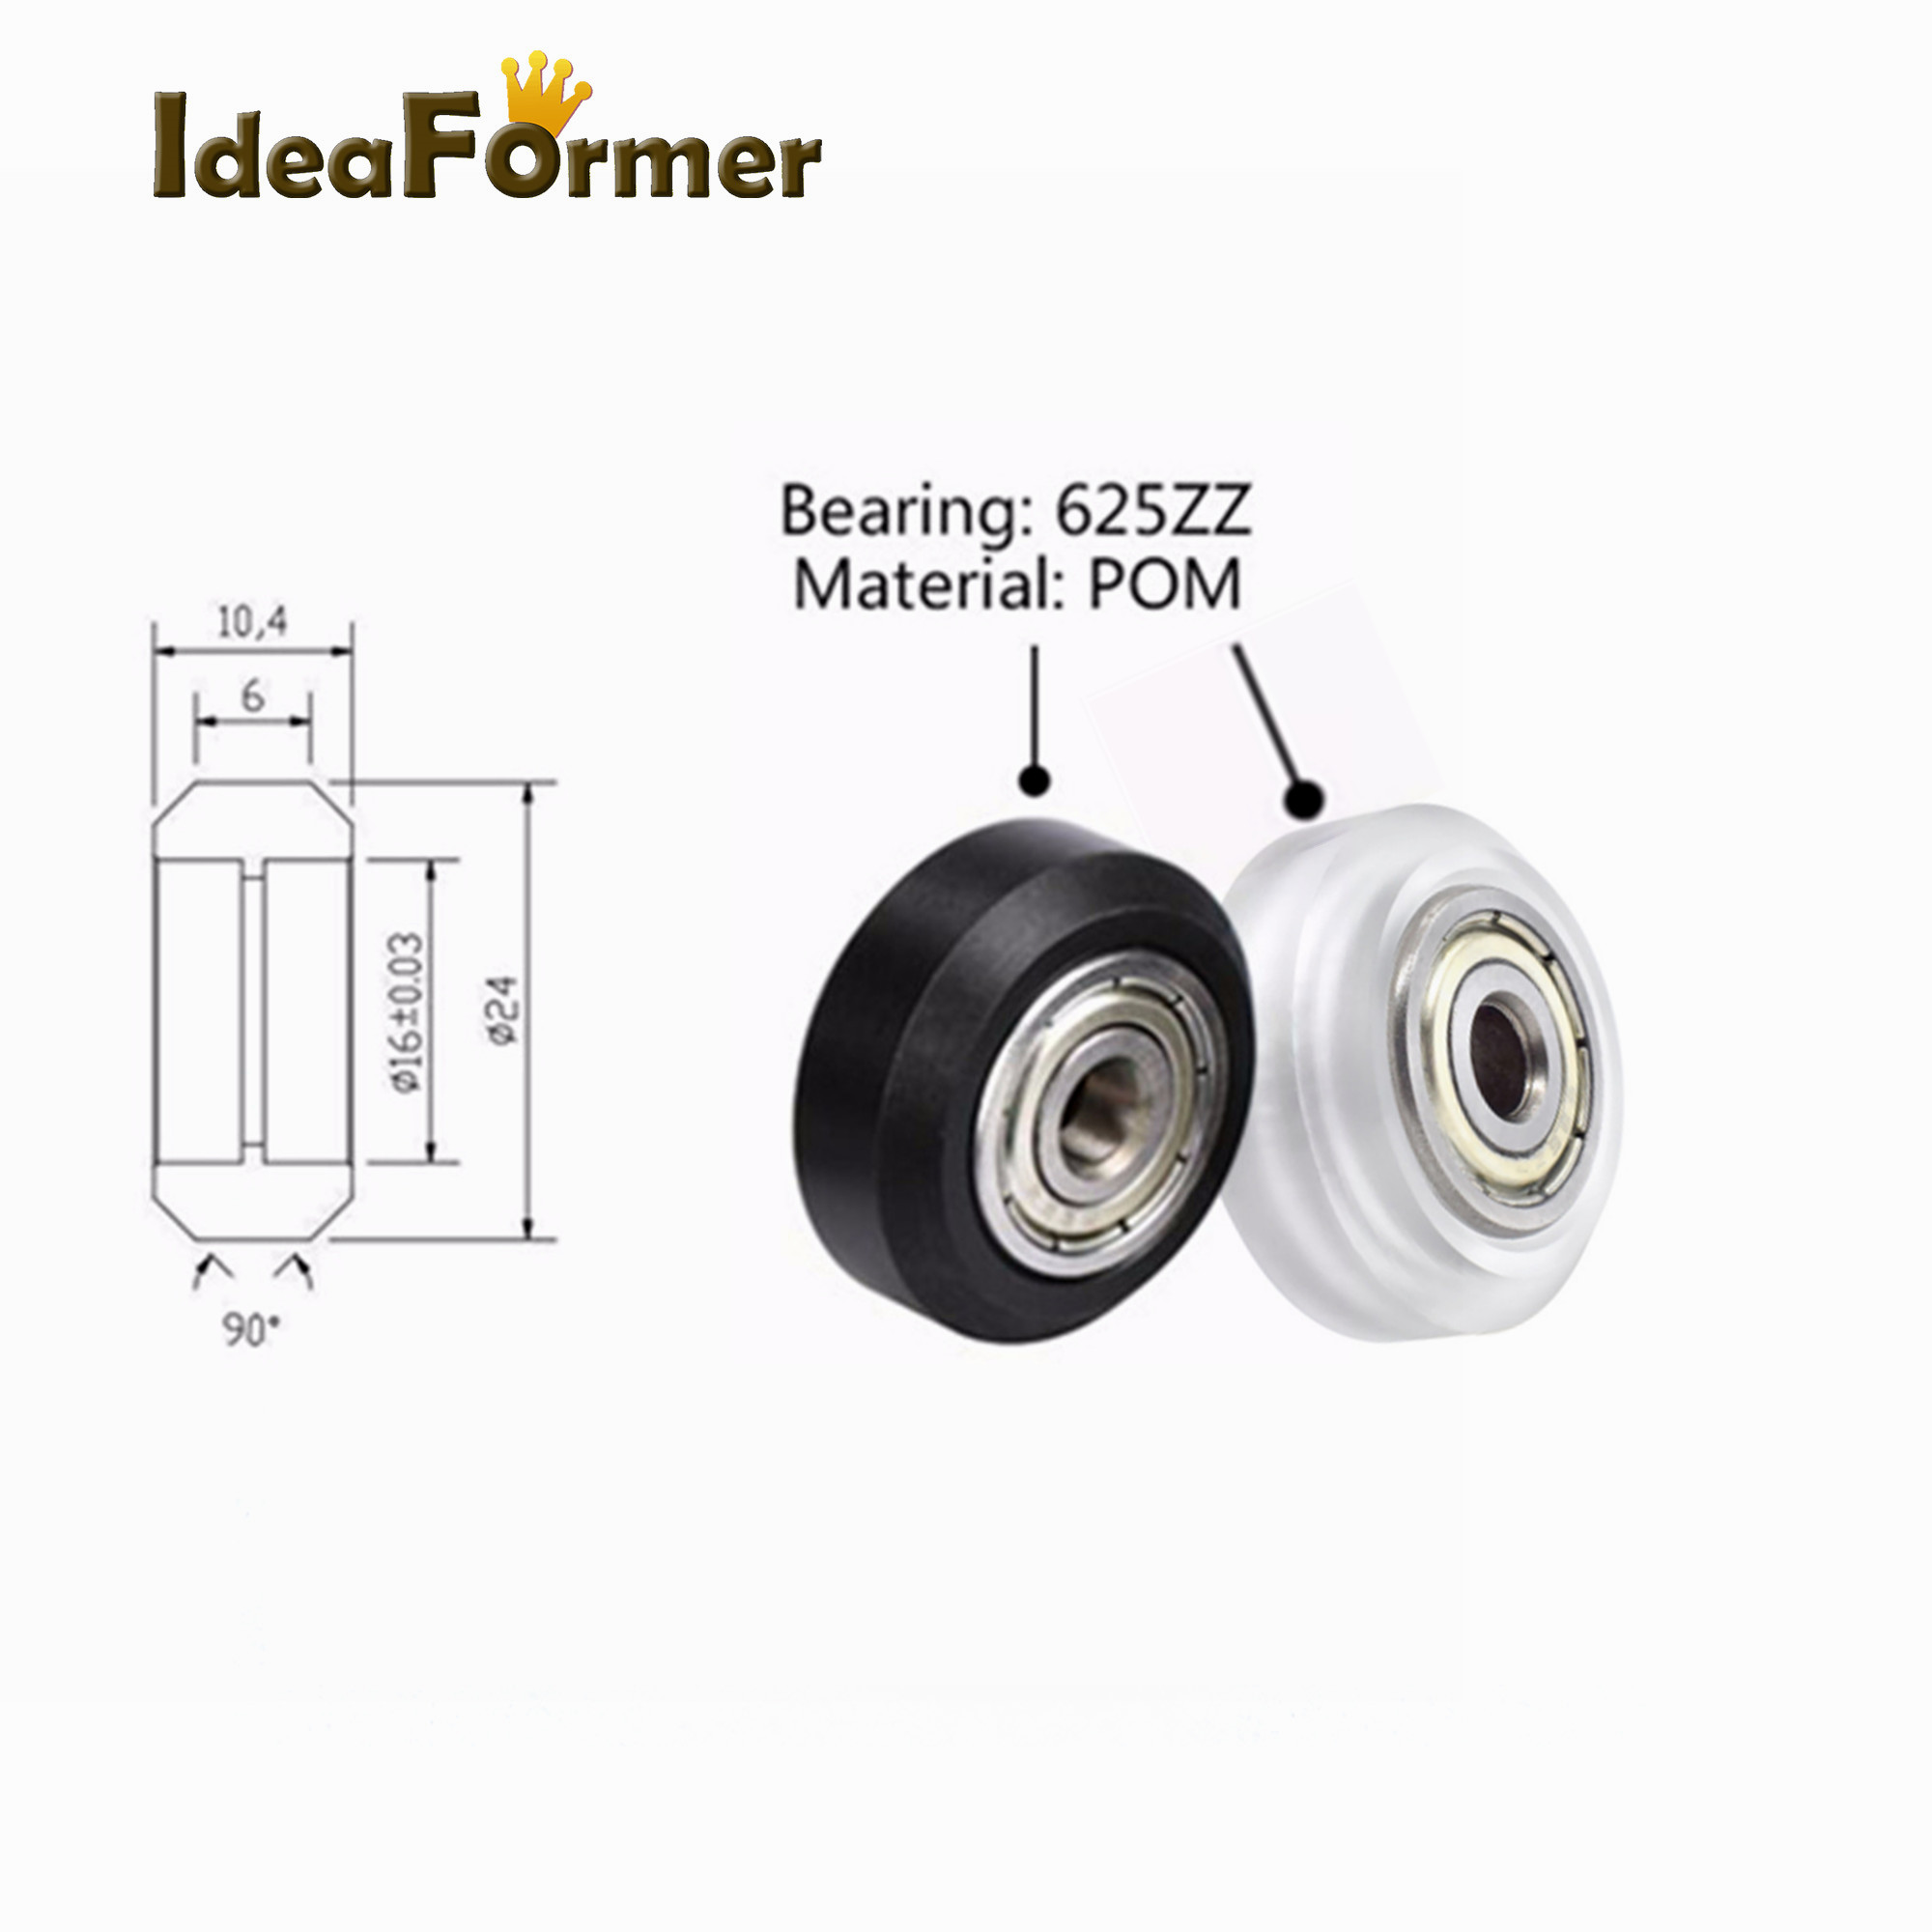 5Pcs Openbuilds CNC Black/Clear Polycarbonate V-groove Wheel Pulley 625ZZ Bearing POM Plastic Wheel For CNC 3D Printer Parts.